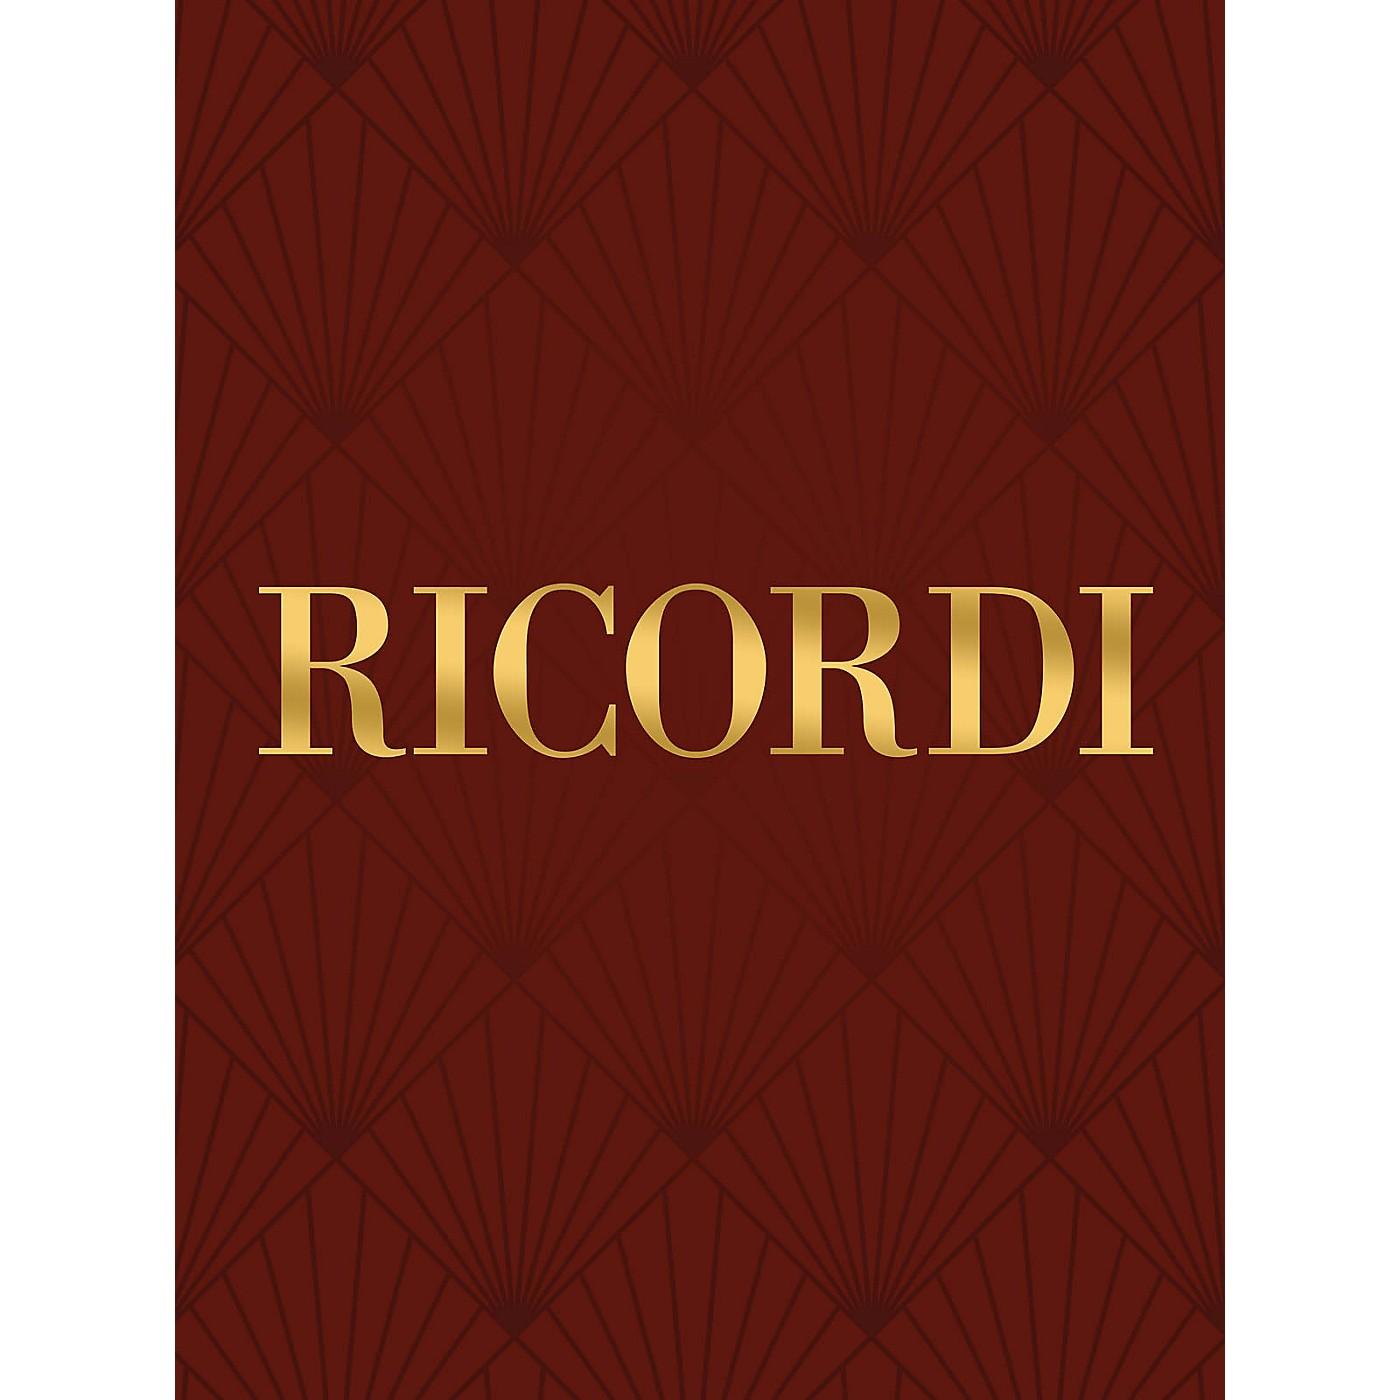 Ricordi Il Mio Primo Debussy (Piano Solo) Piano Collection Series Composed by Claude Debussy Edited by J Demus thumbnail